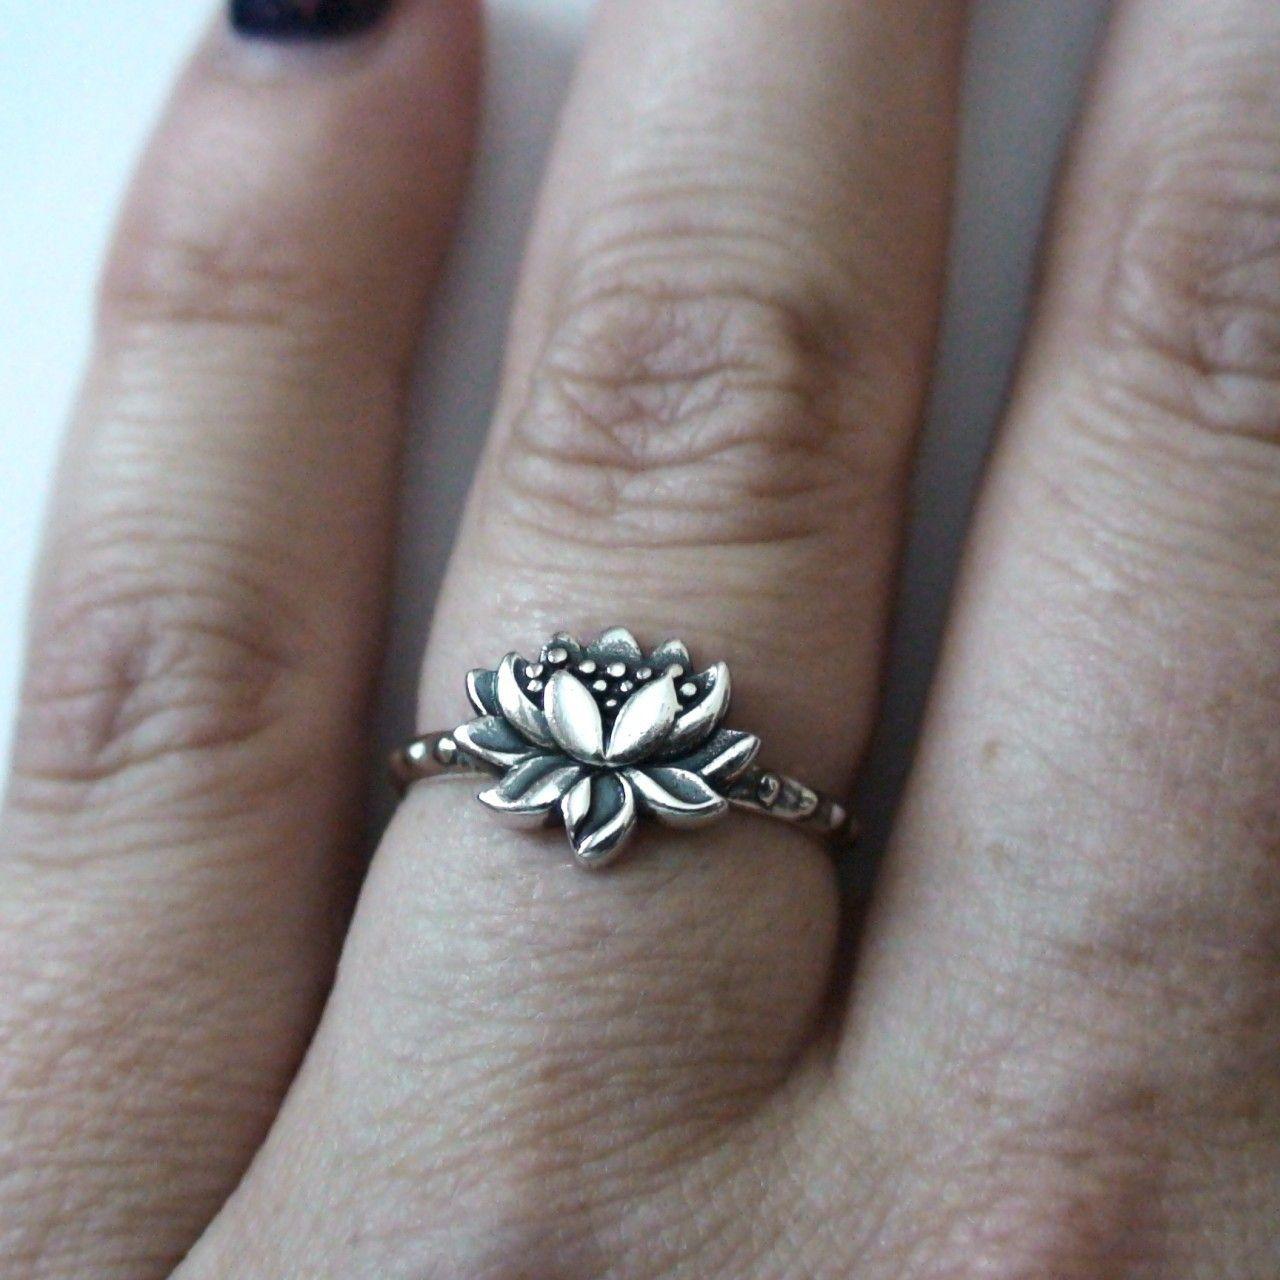 Fashionjunkie4life sterling silver lotus flower ring 2000 http fashionjunkie4life sterling silver lotus flower ring 2000 http izmirmasajfo